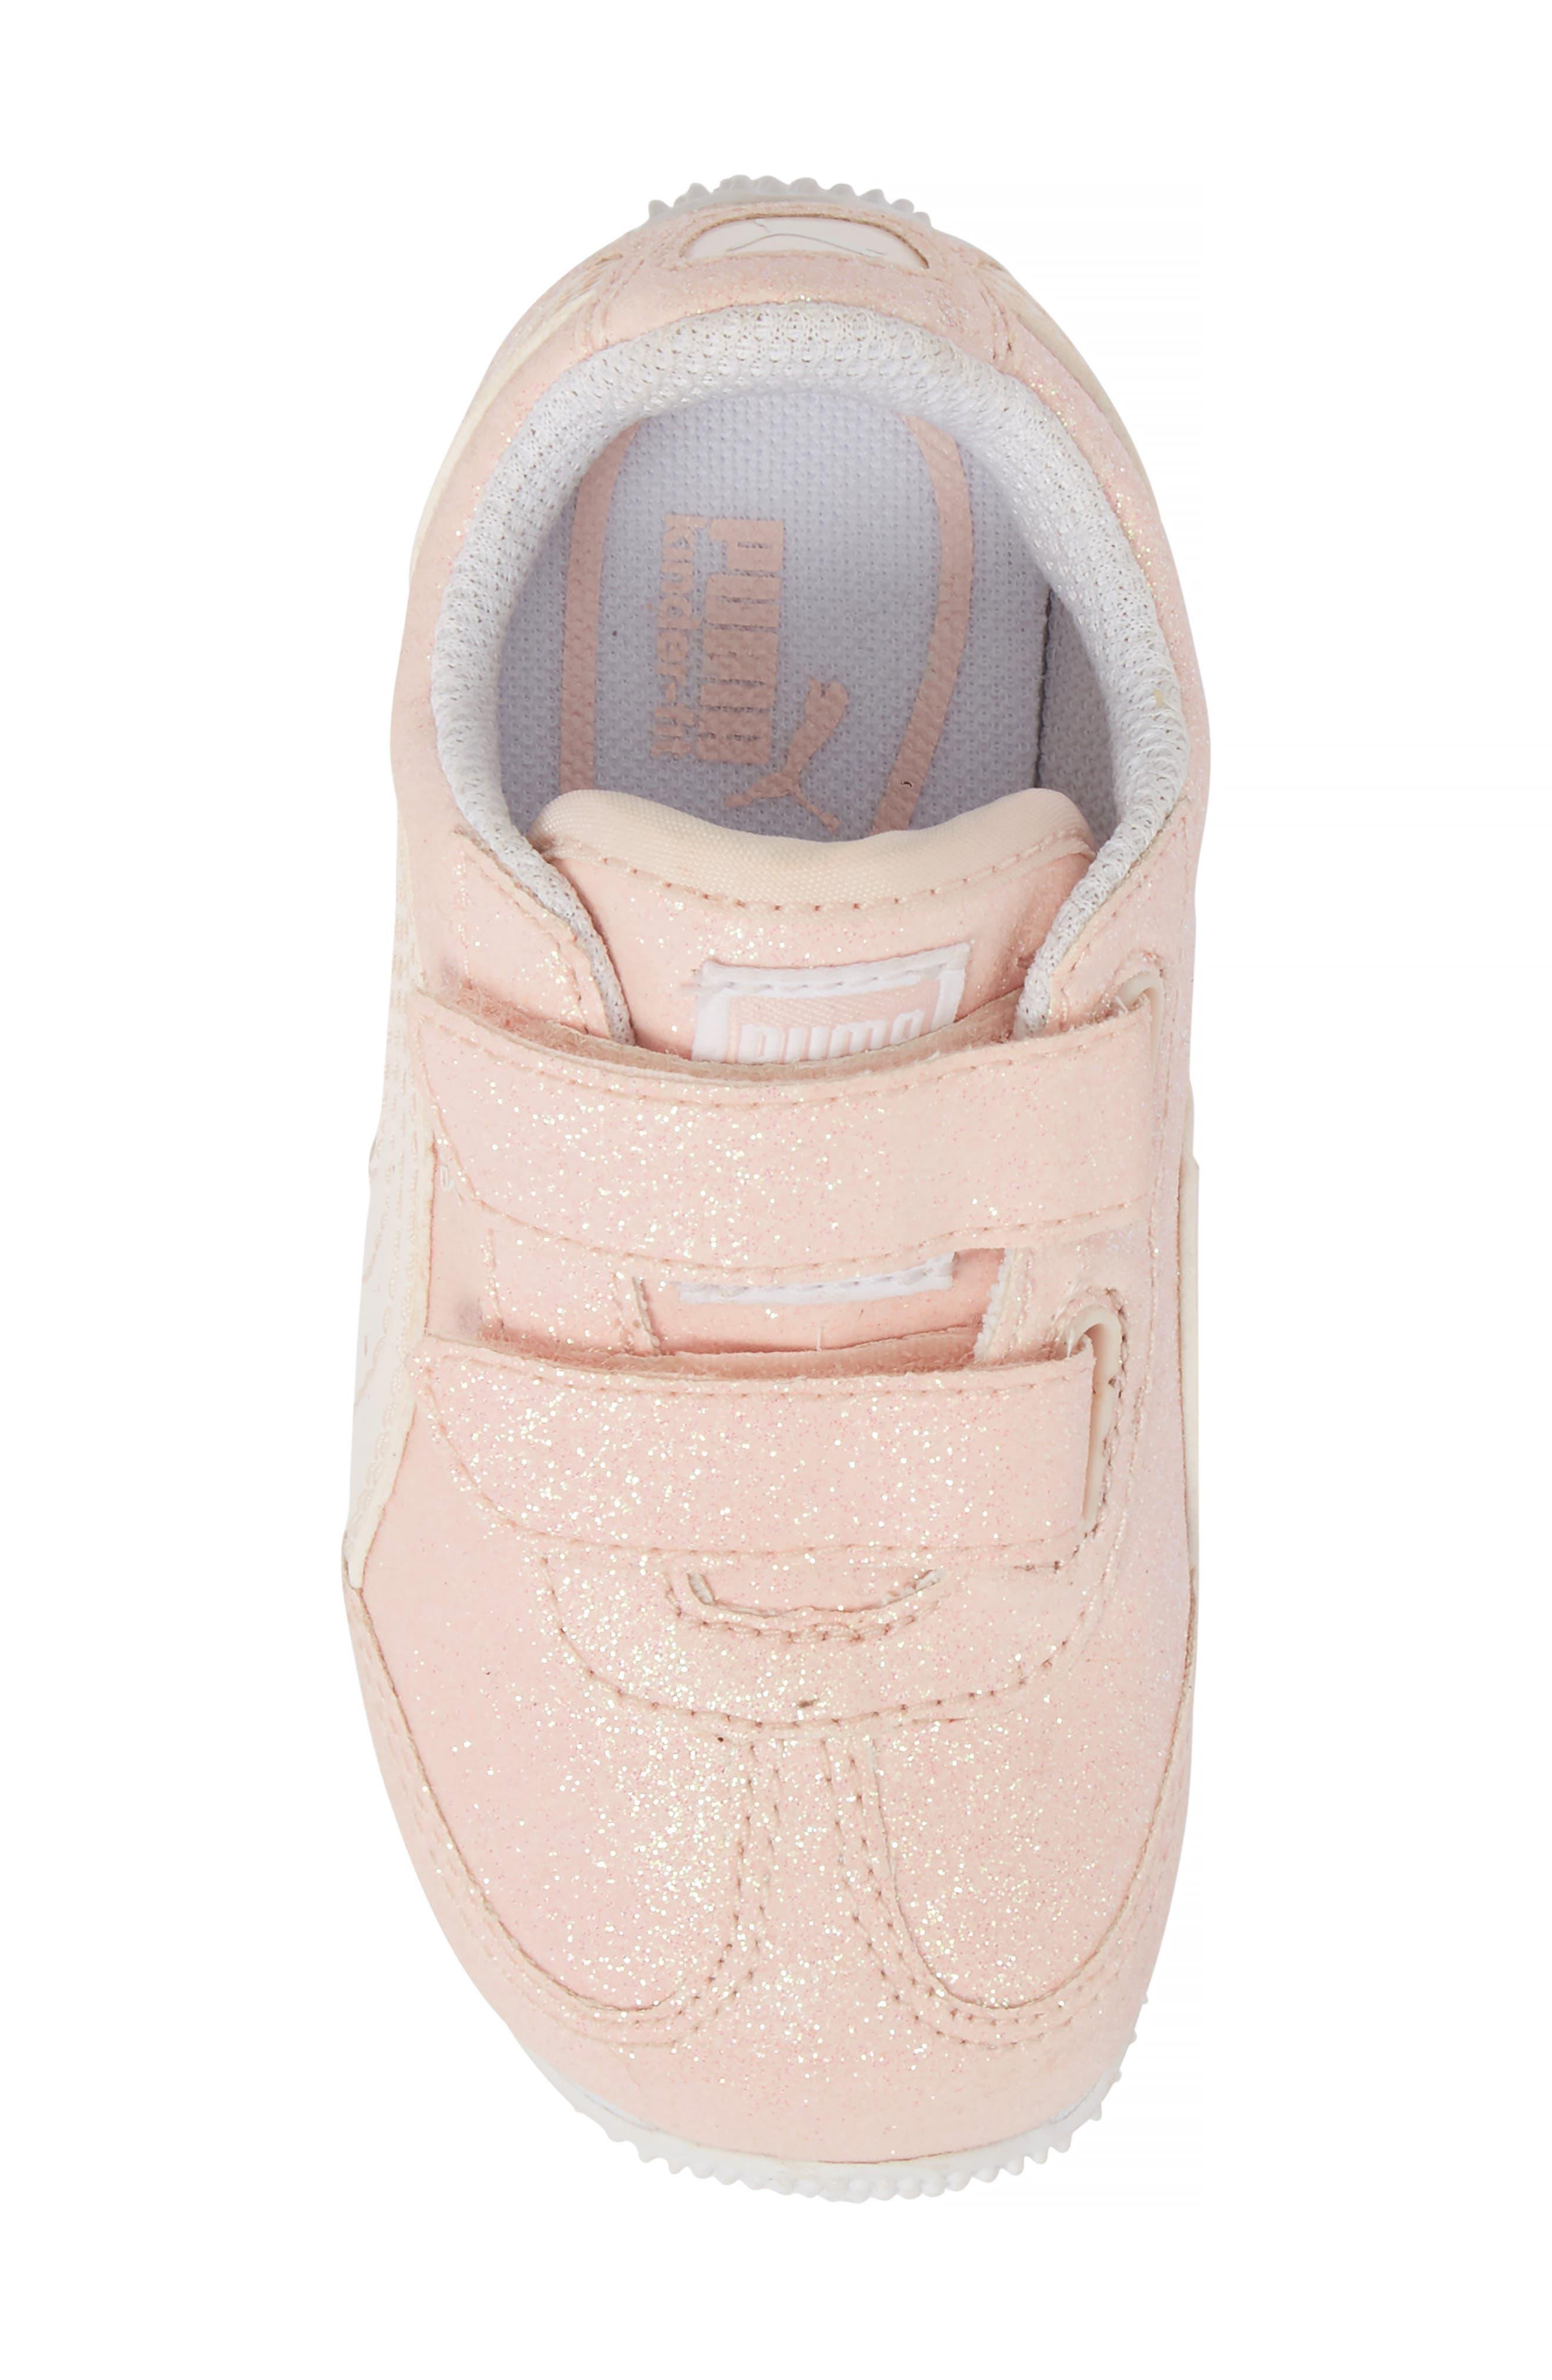 PUMA, Whirlwind Glitz Sneaker, Alternate thumbnail 5, color, 690